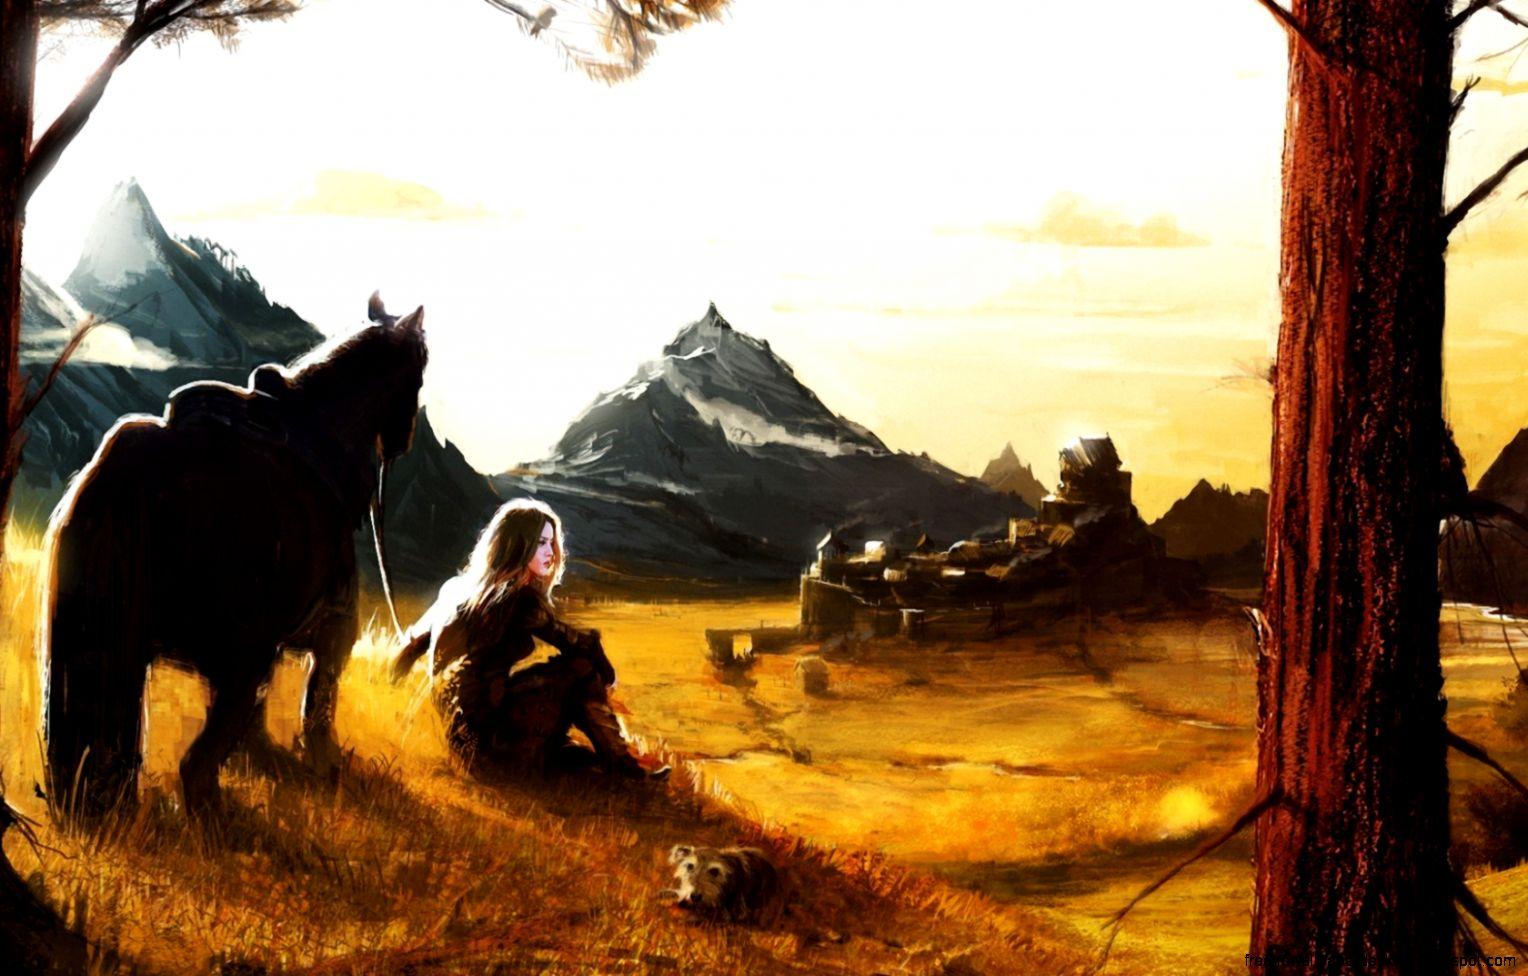 Popular   Wallpaper Horse Art - art-girl-horse-dog-mountain-village-hd-wallpaper-freewallsup  Image_8310098.jpg